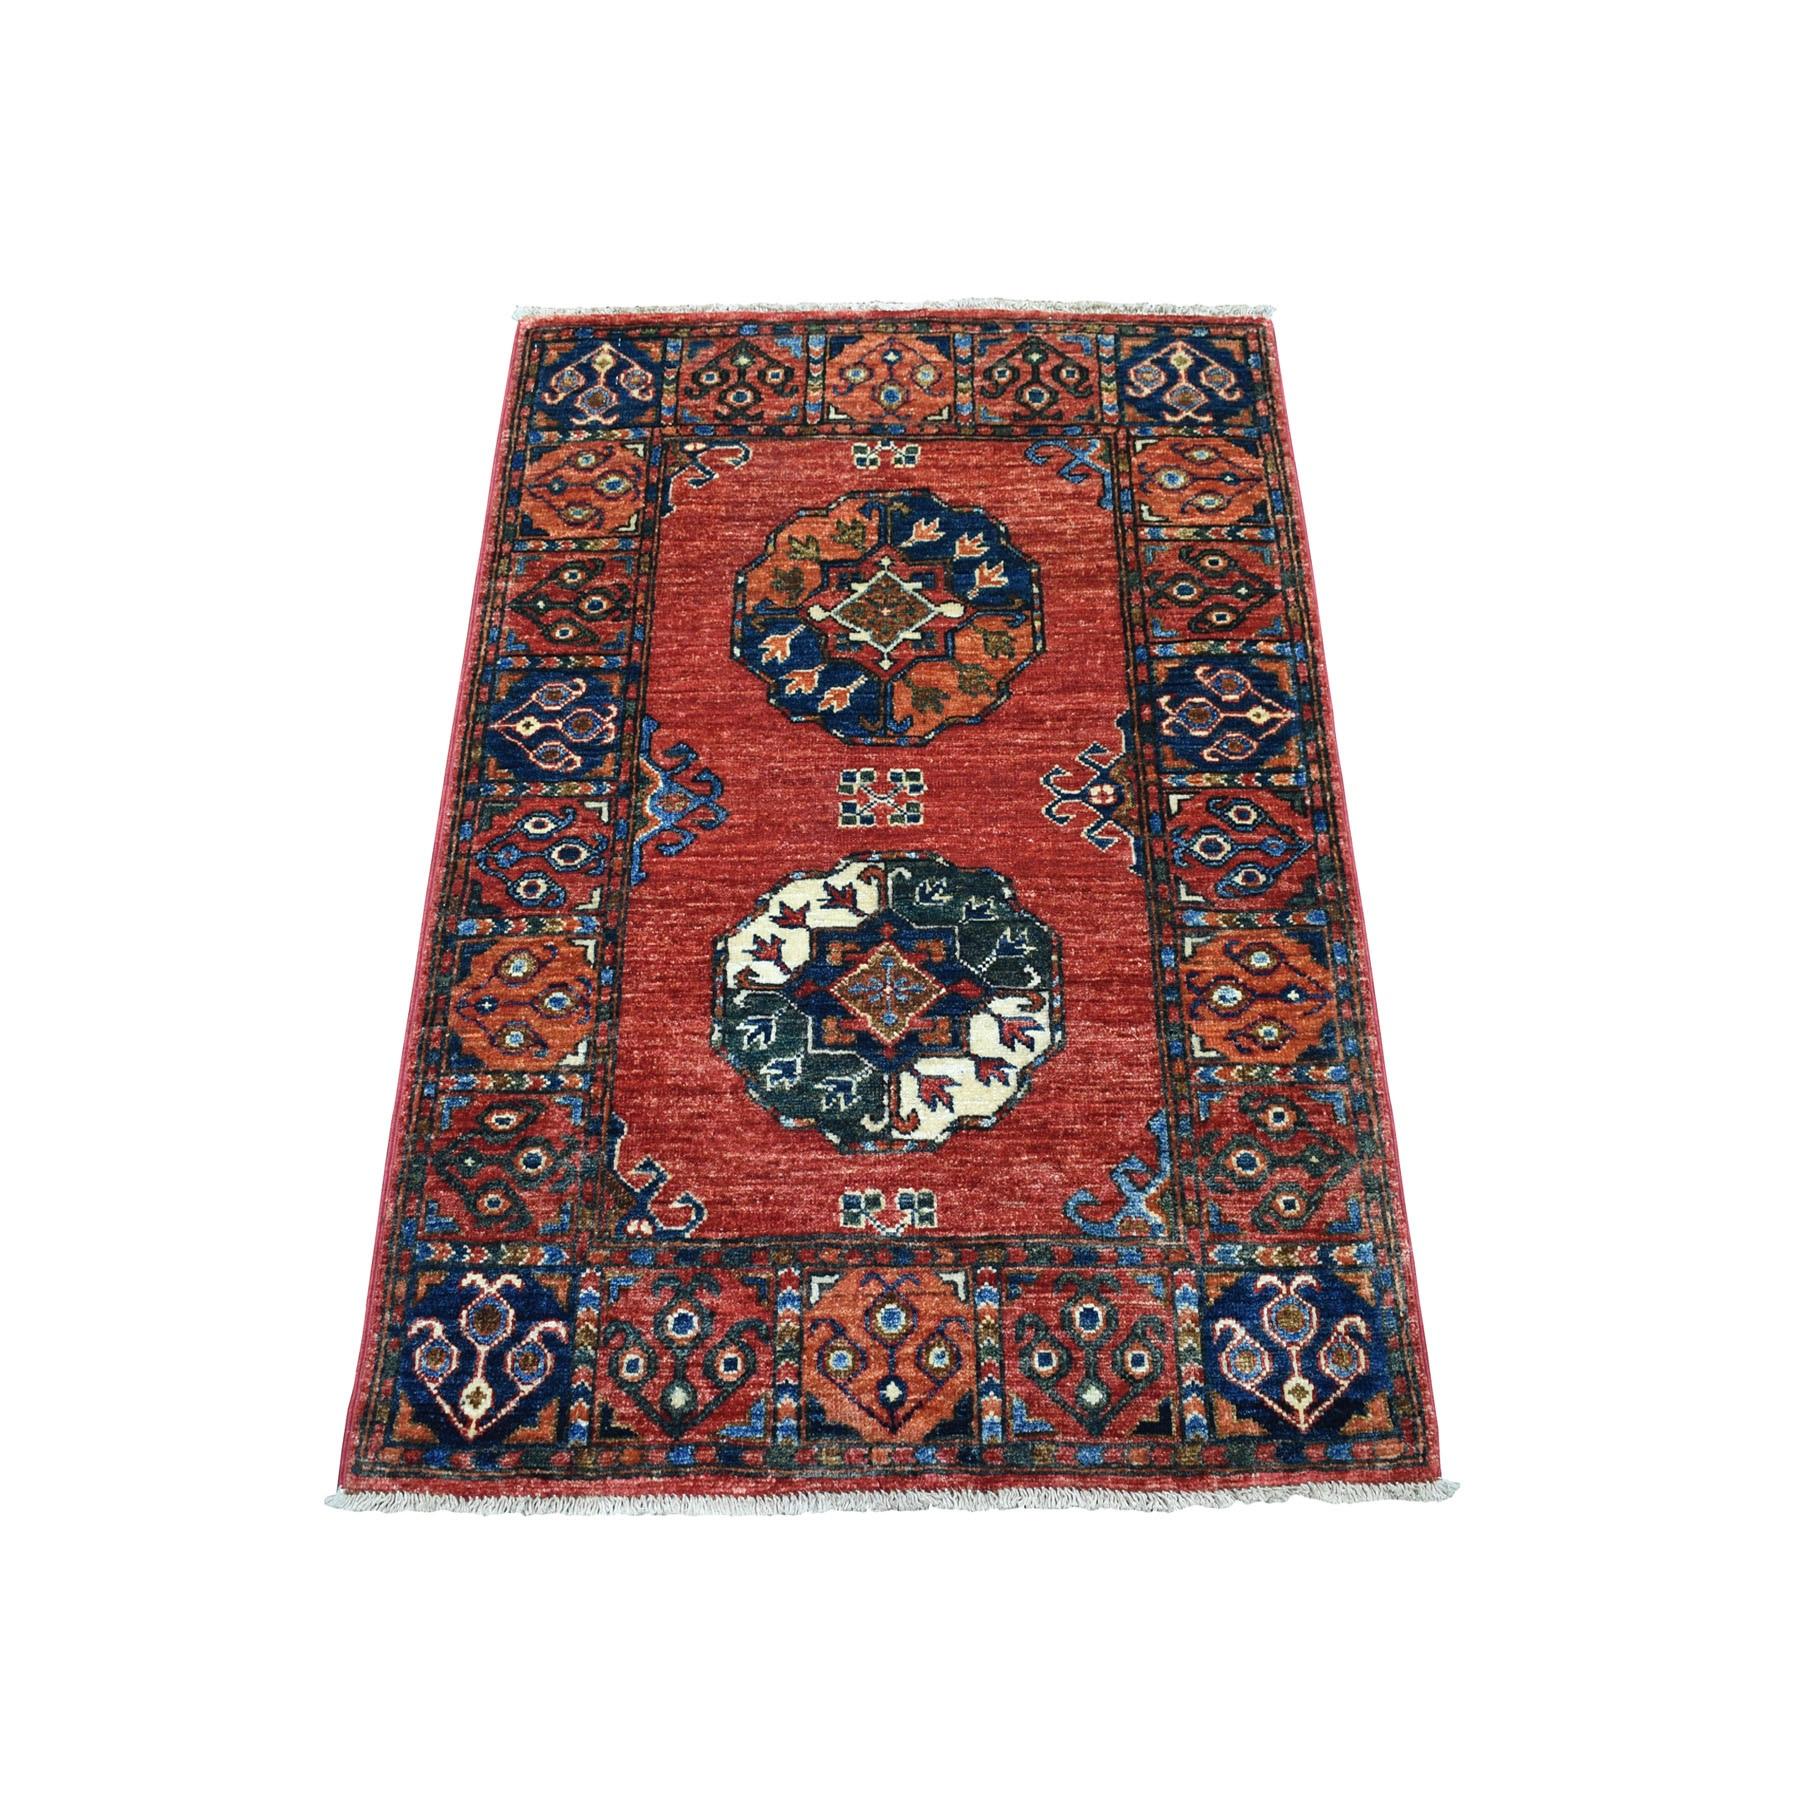 "2'8""X3'10"" Red Afghan Ersari Elephant Feet Design Pure Wool Hand Knotted Oriental Rug moaeca96"